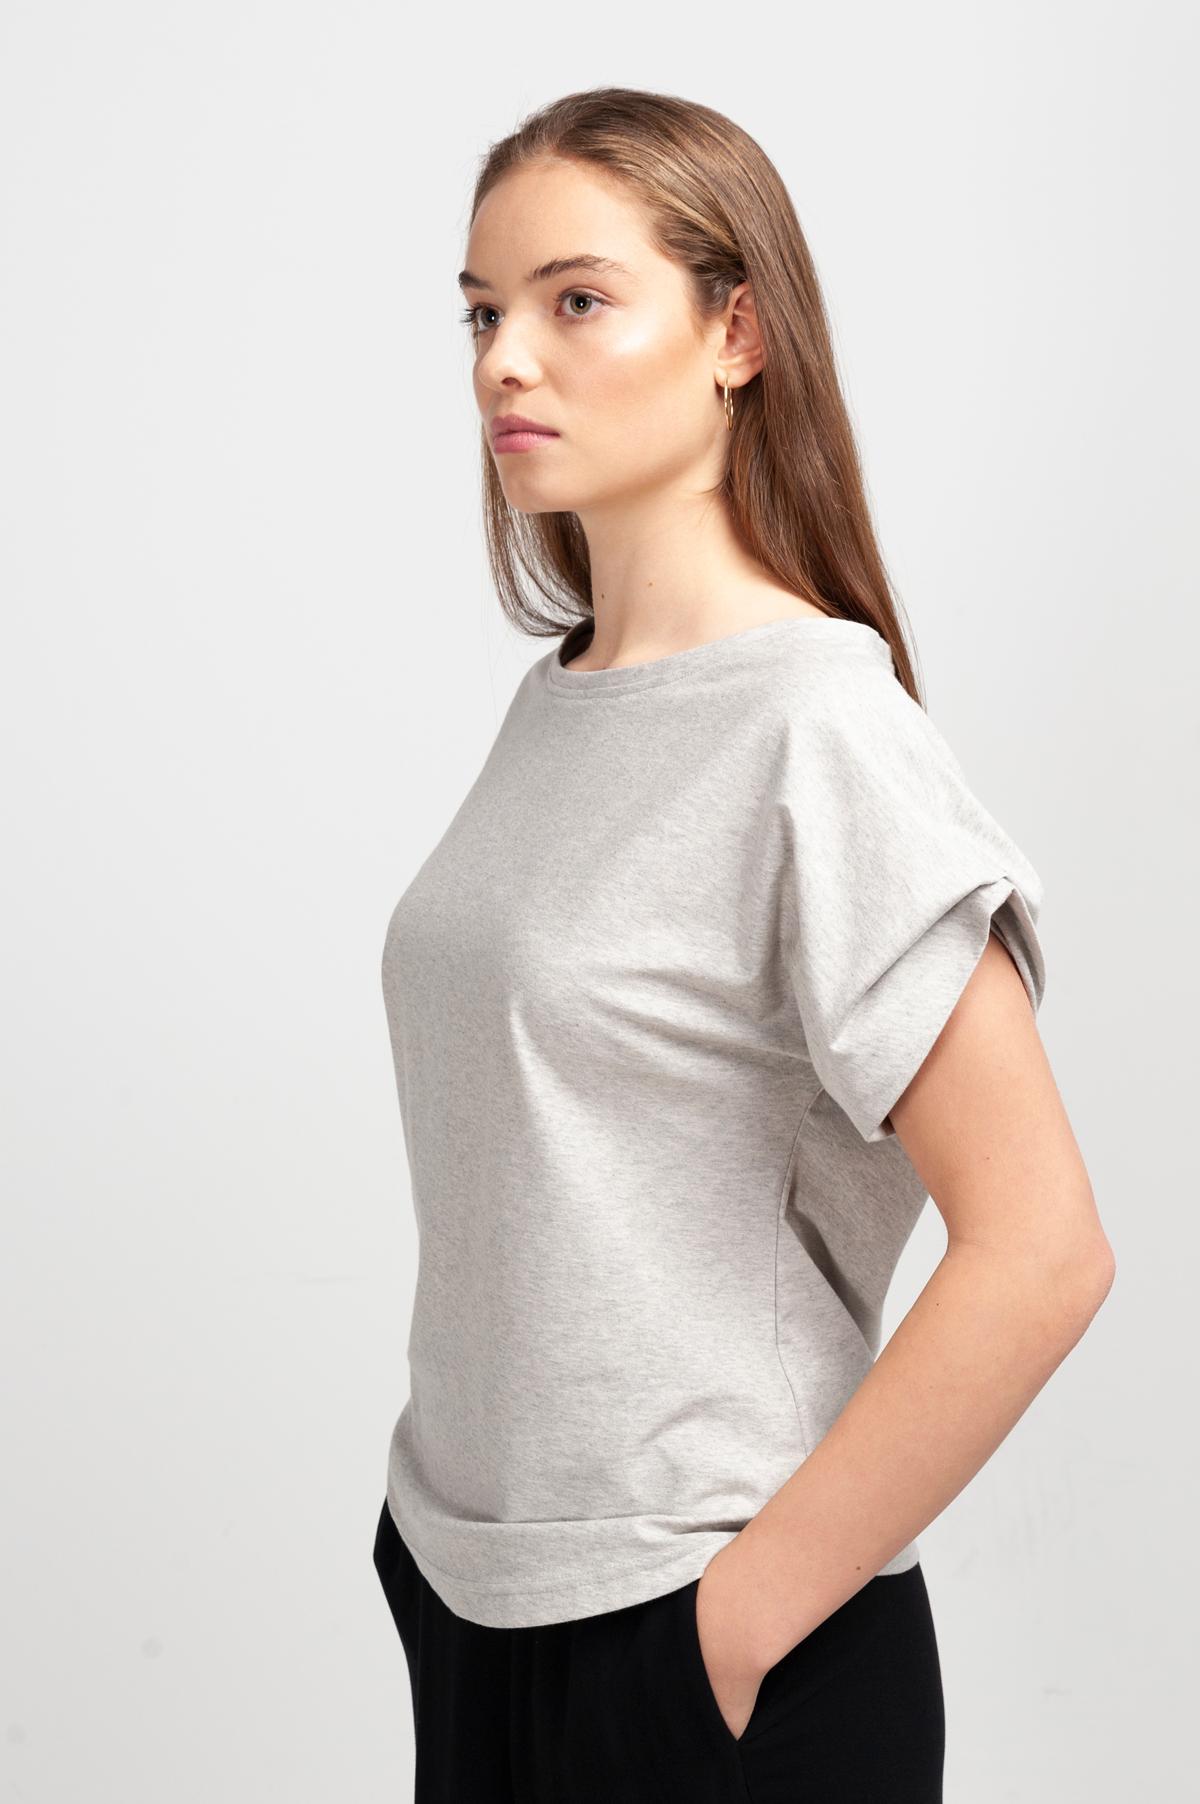 Roberta Organic Fashion Shipsheip T Shirt Ellie Blouse Grau Meliert (4)